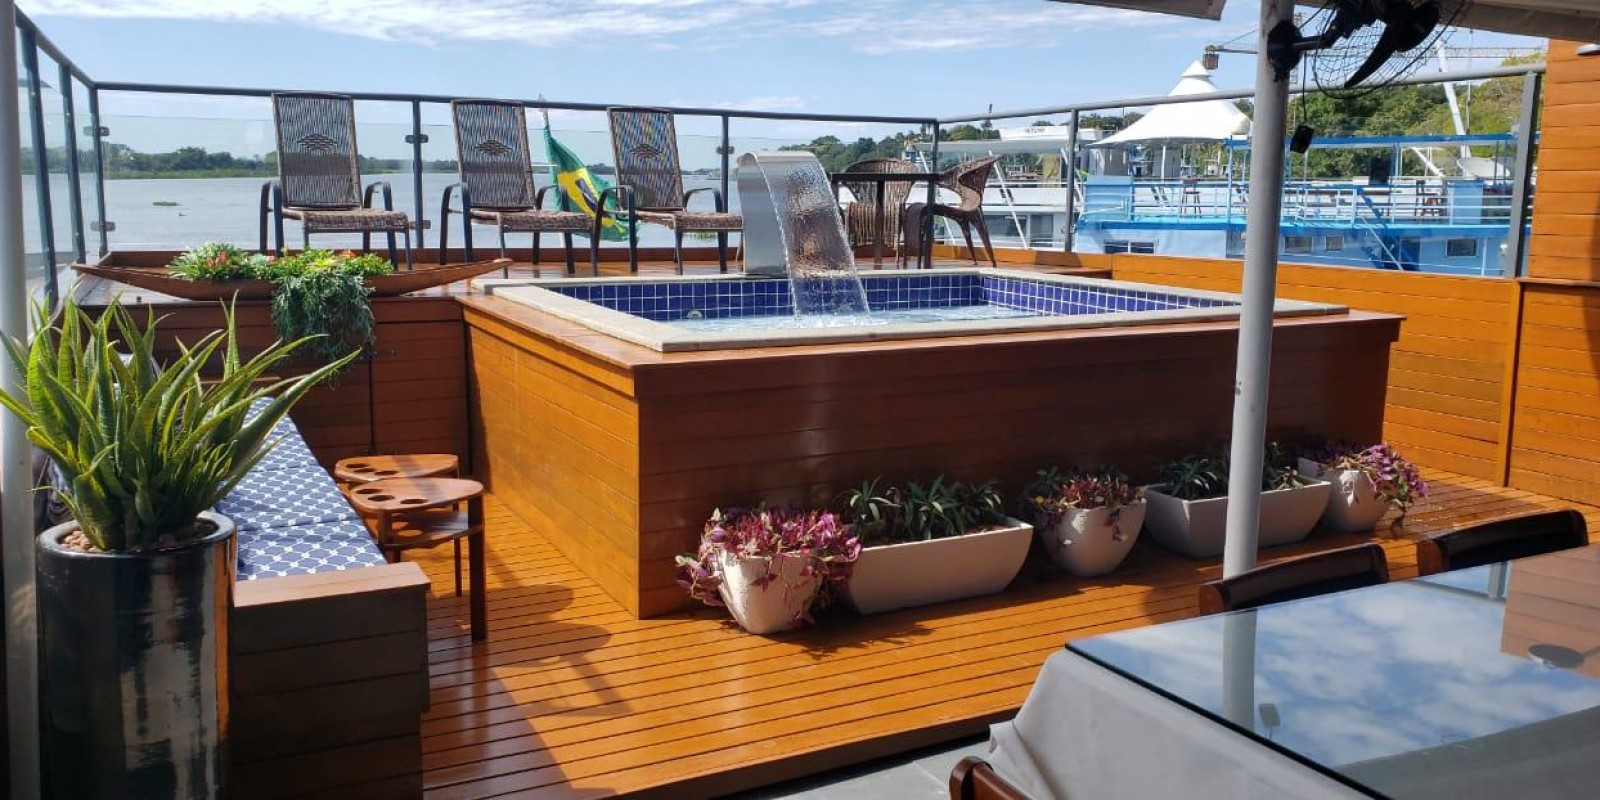 Barco Hotel Netuno - Corumbá - 24 pessoas - Foto 8 de 15